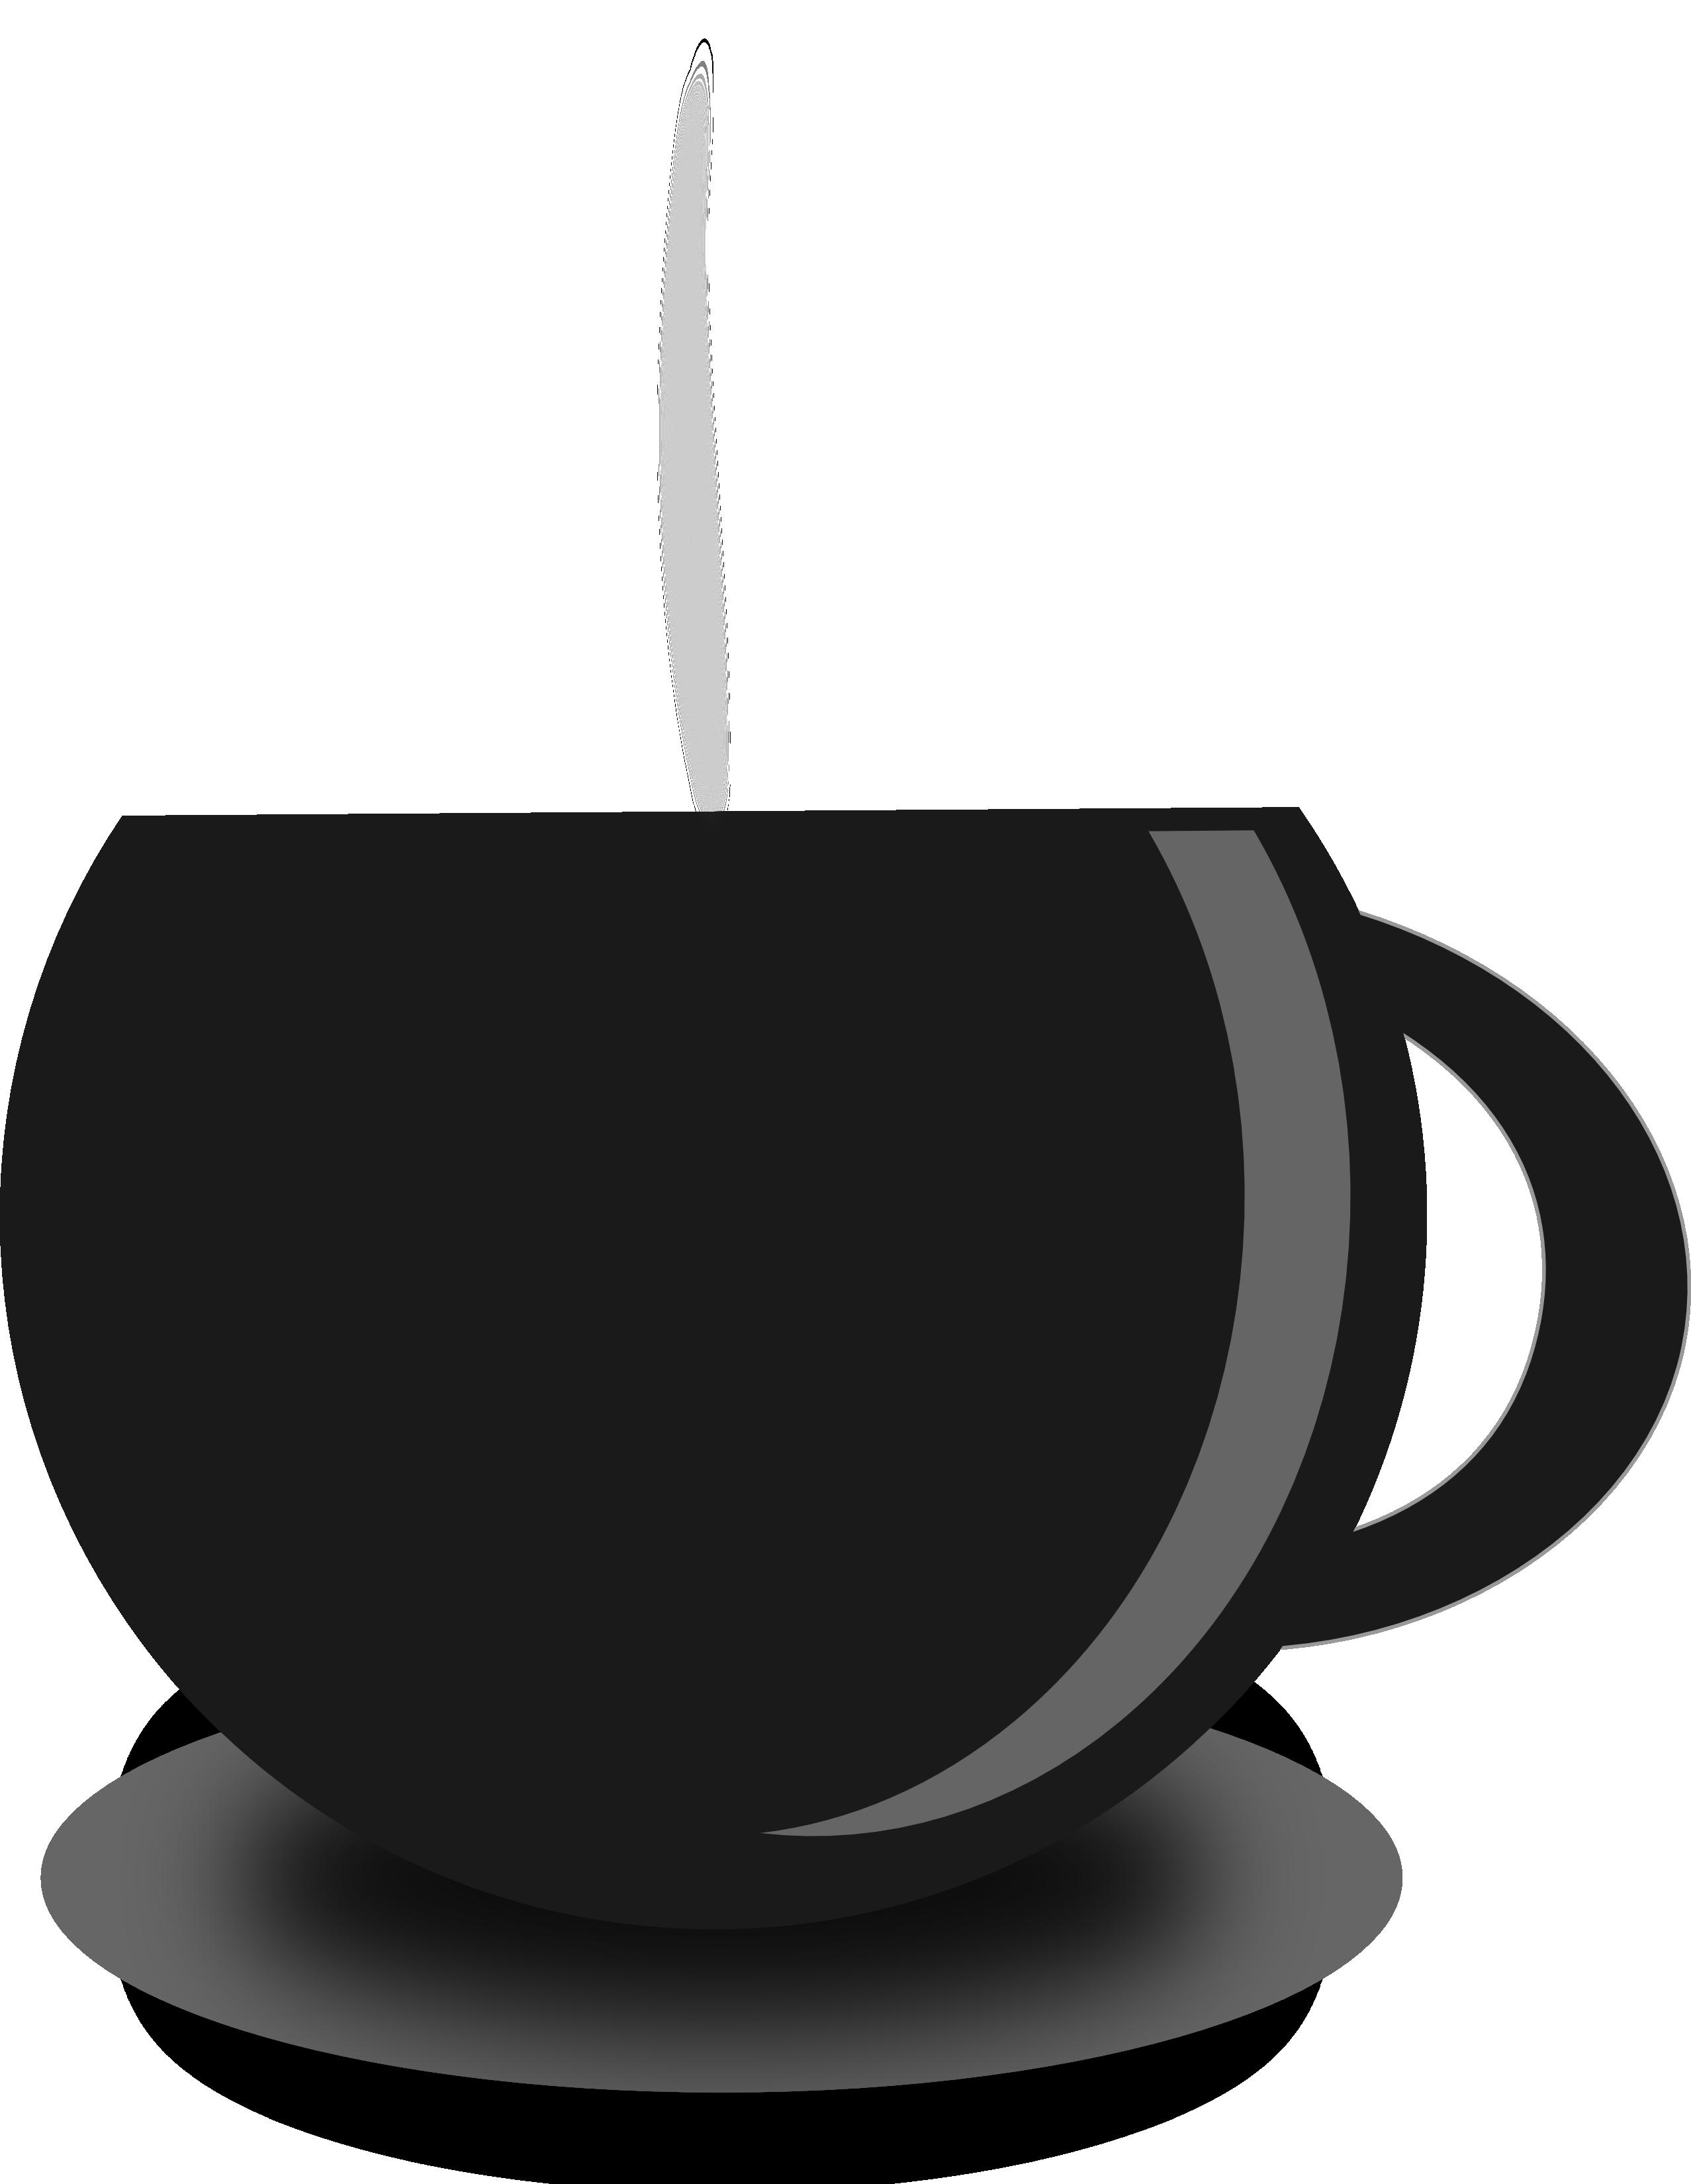 vintage teacup clipart-vintage teacup clipart-14